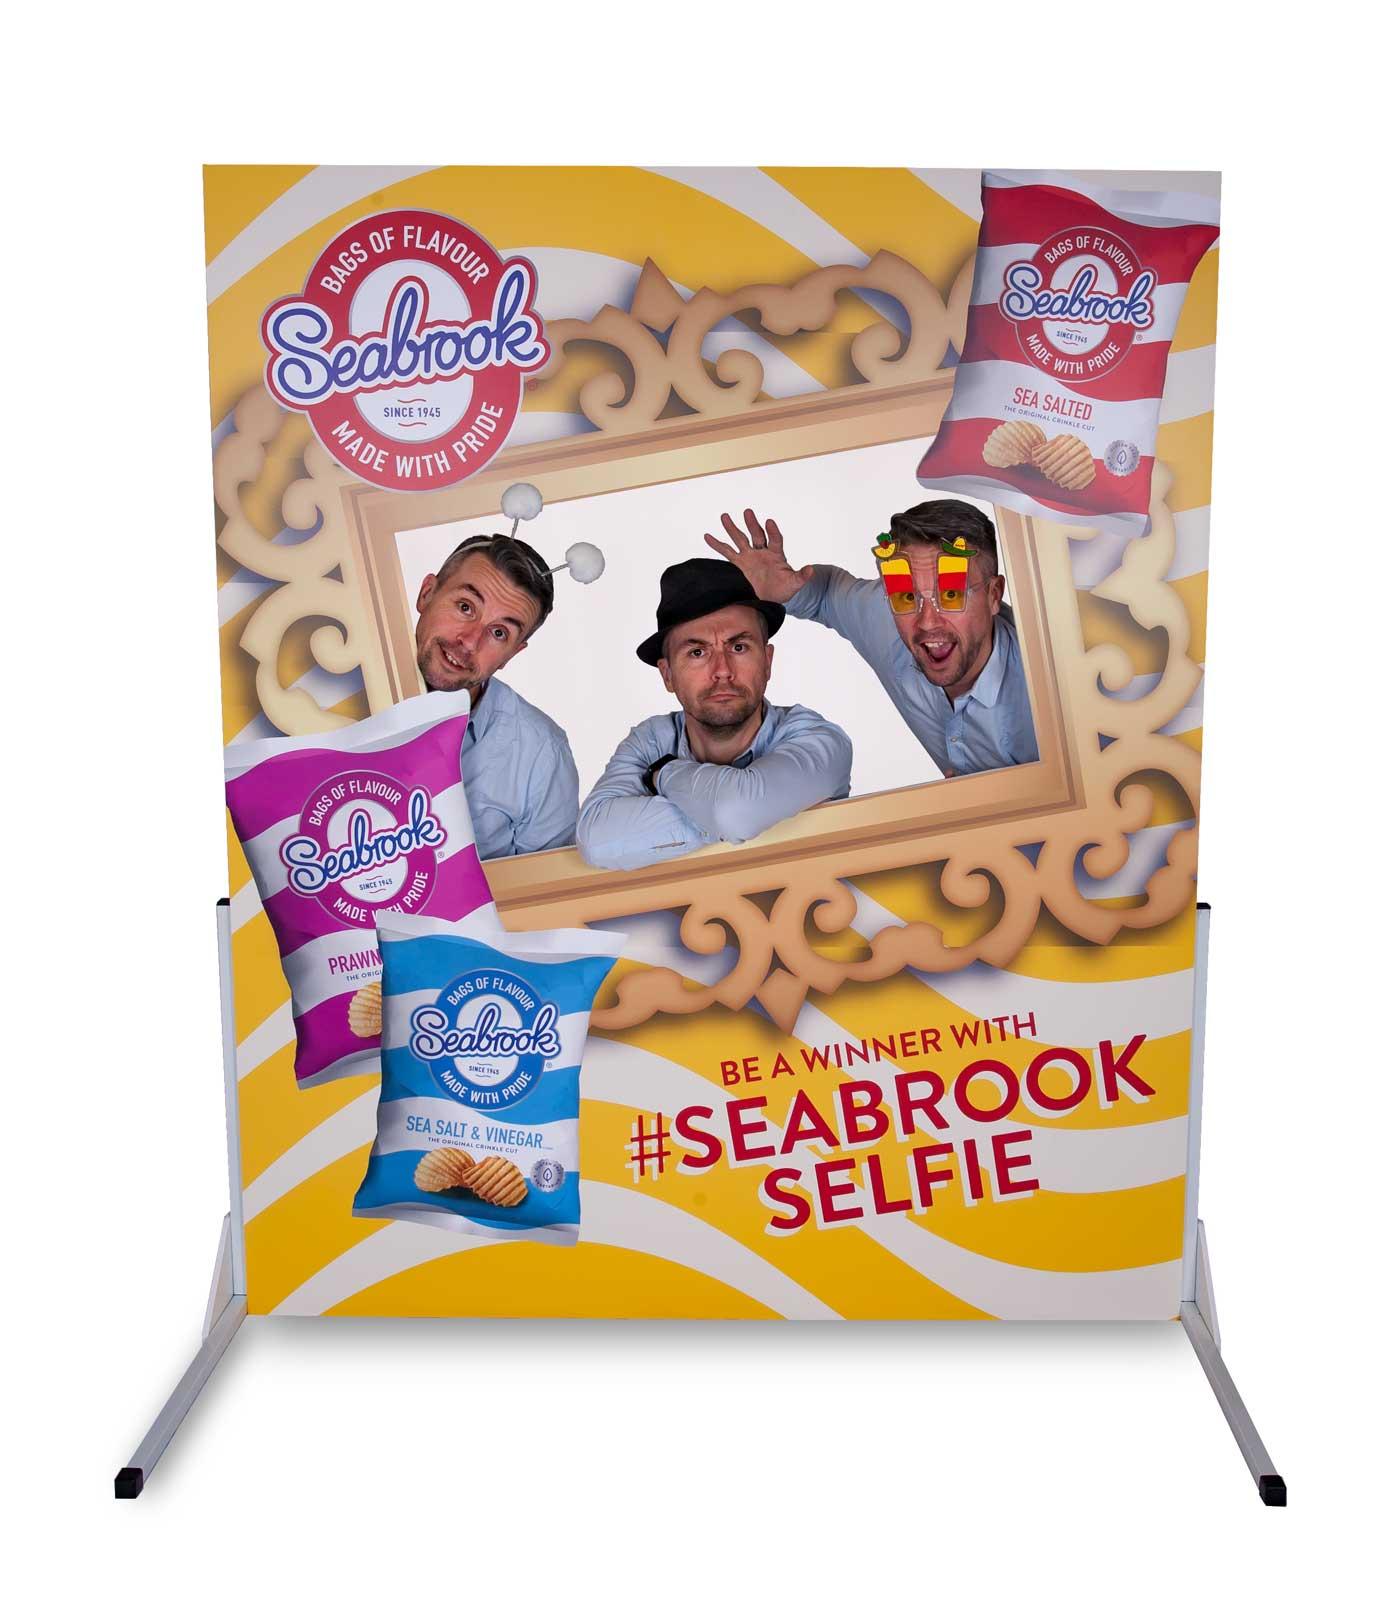 Photo cutout board marketing